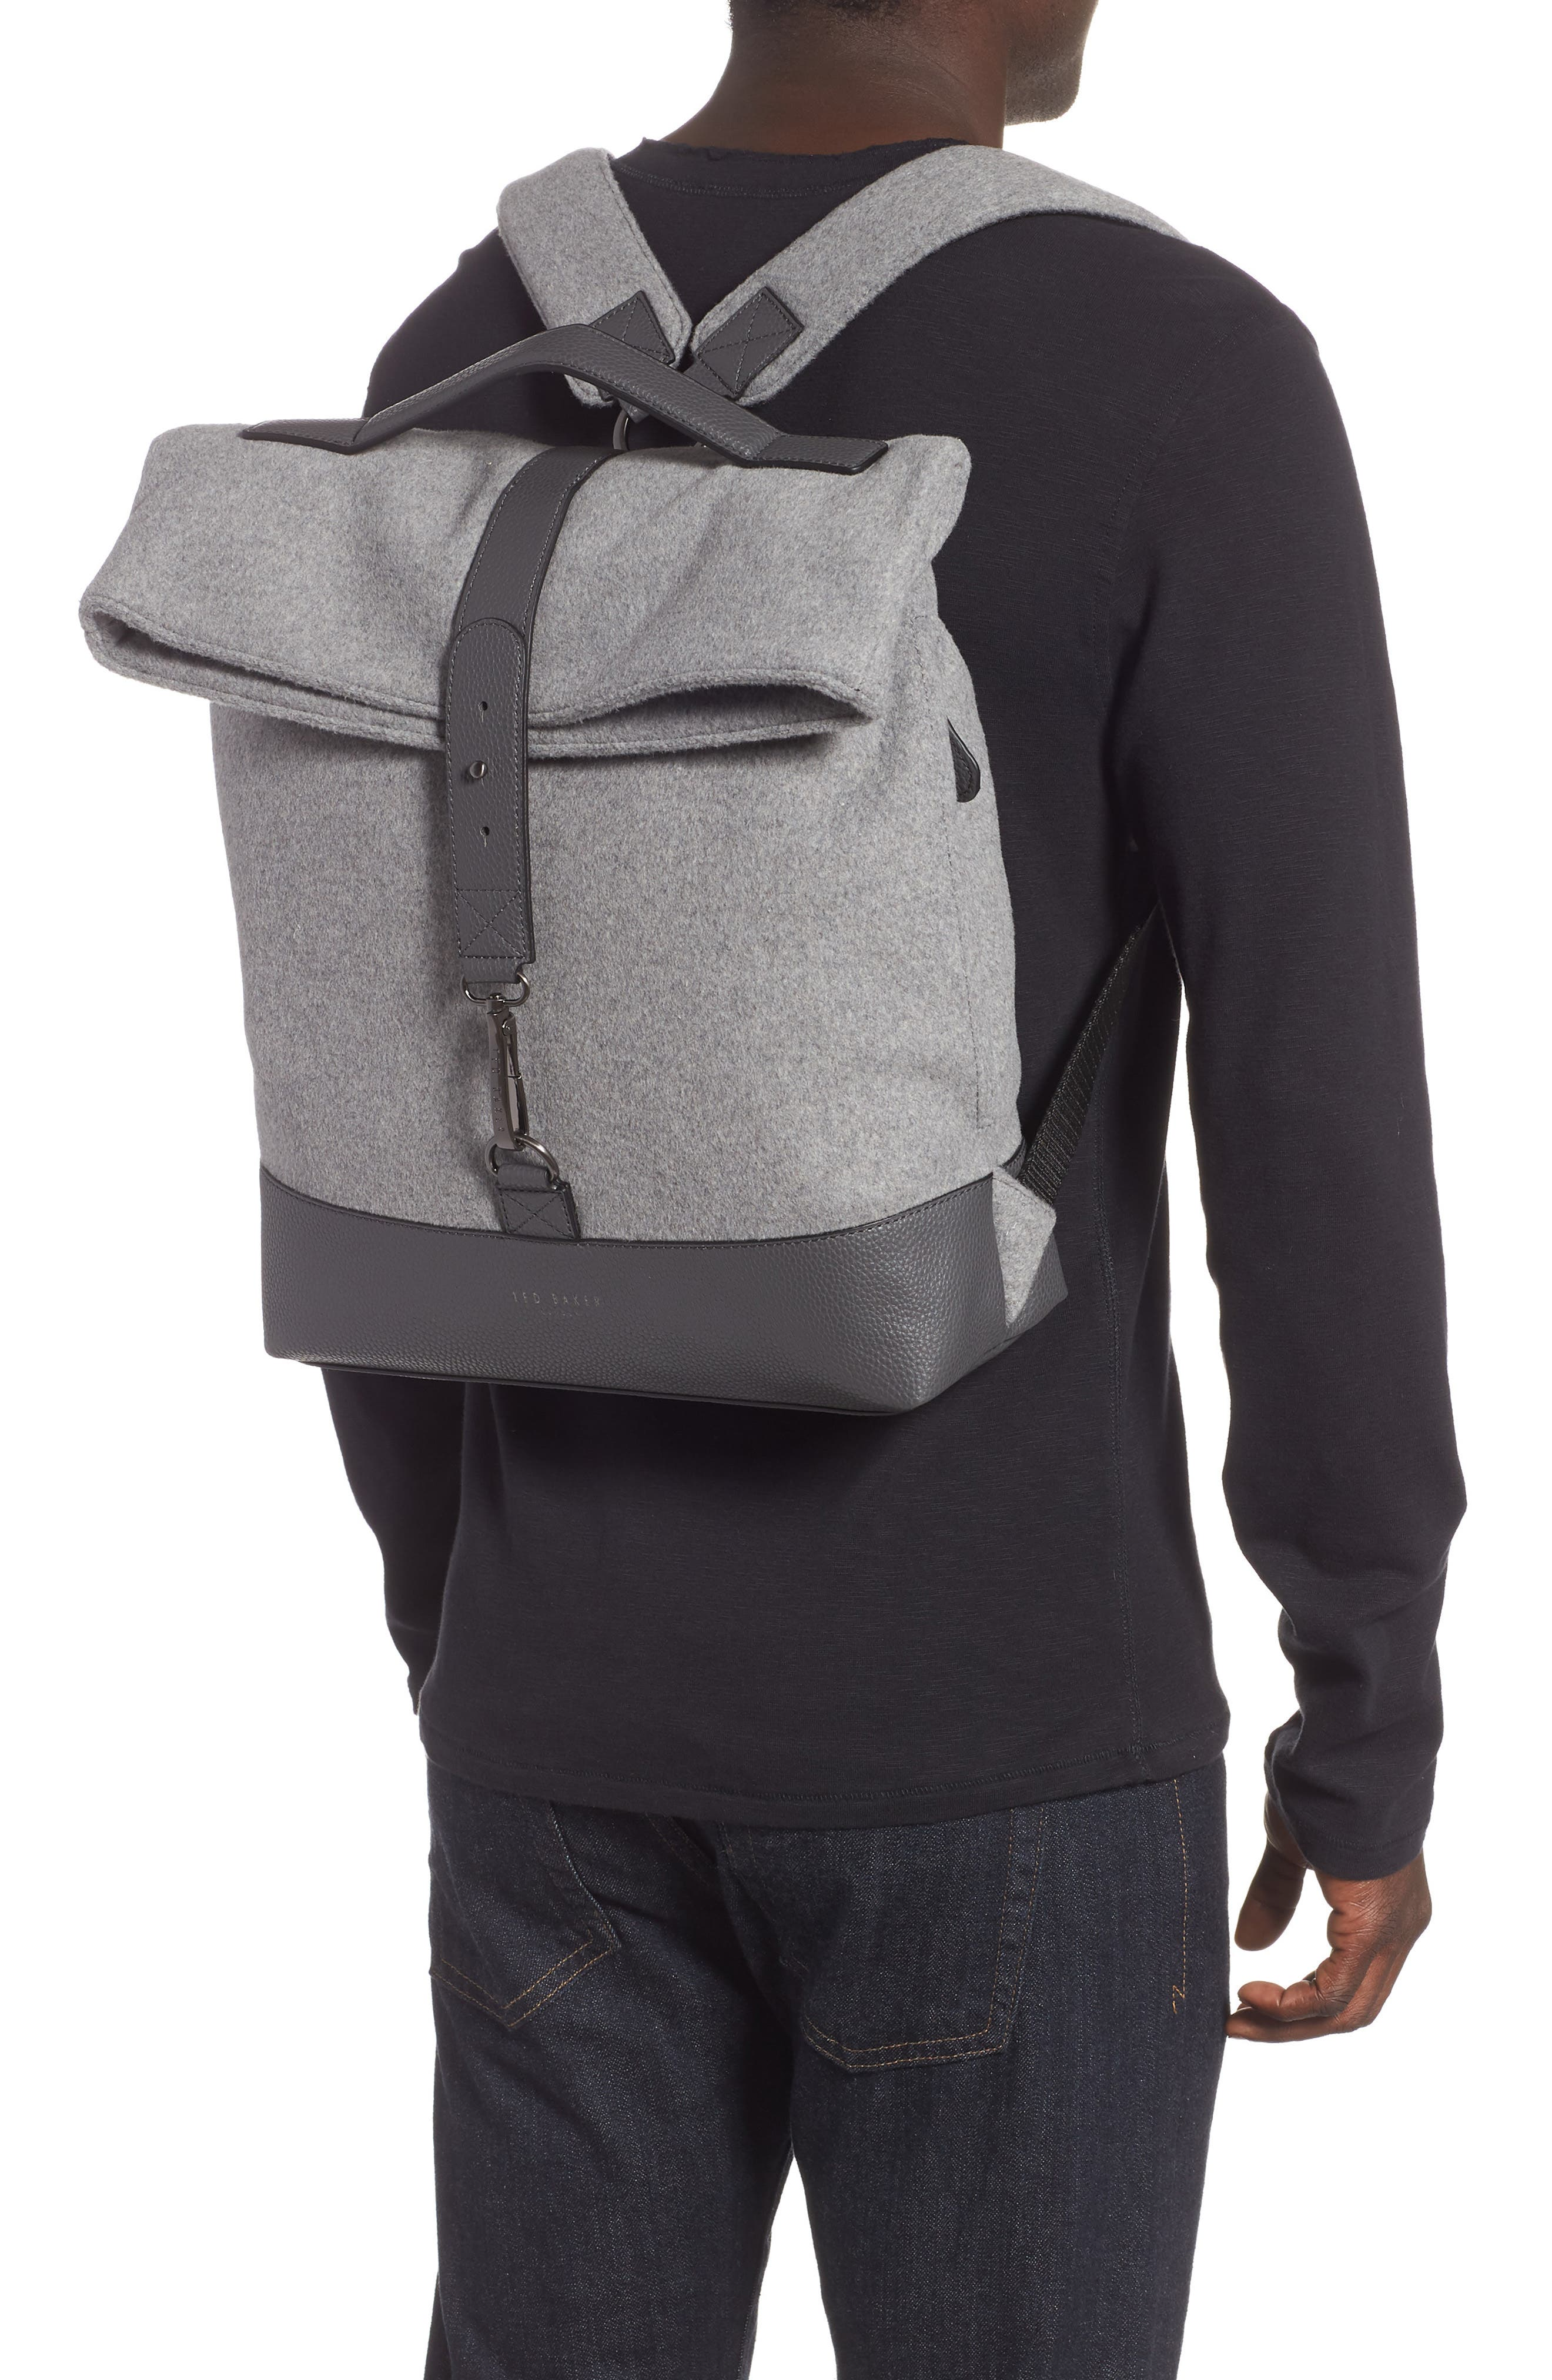 Cashed Backpack,                             Alternate thumbnail 2, color,